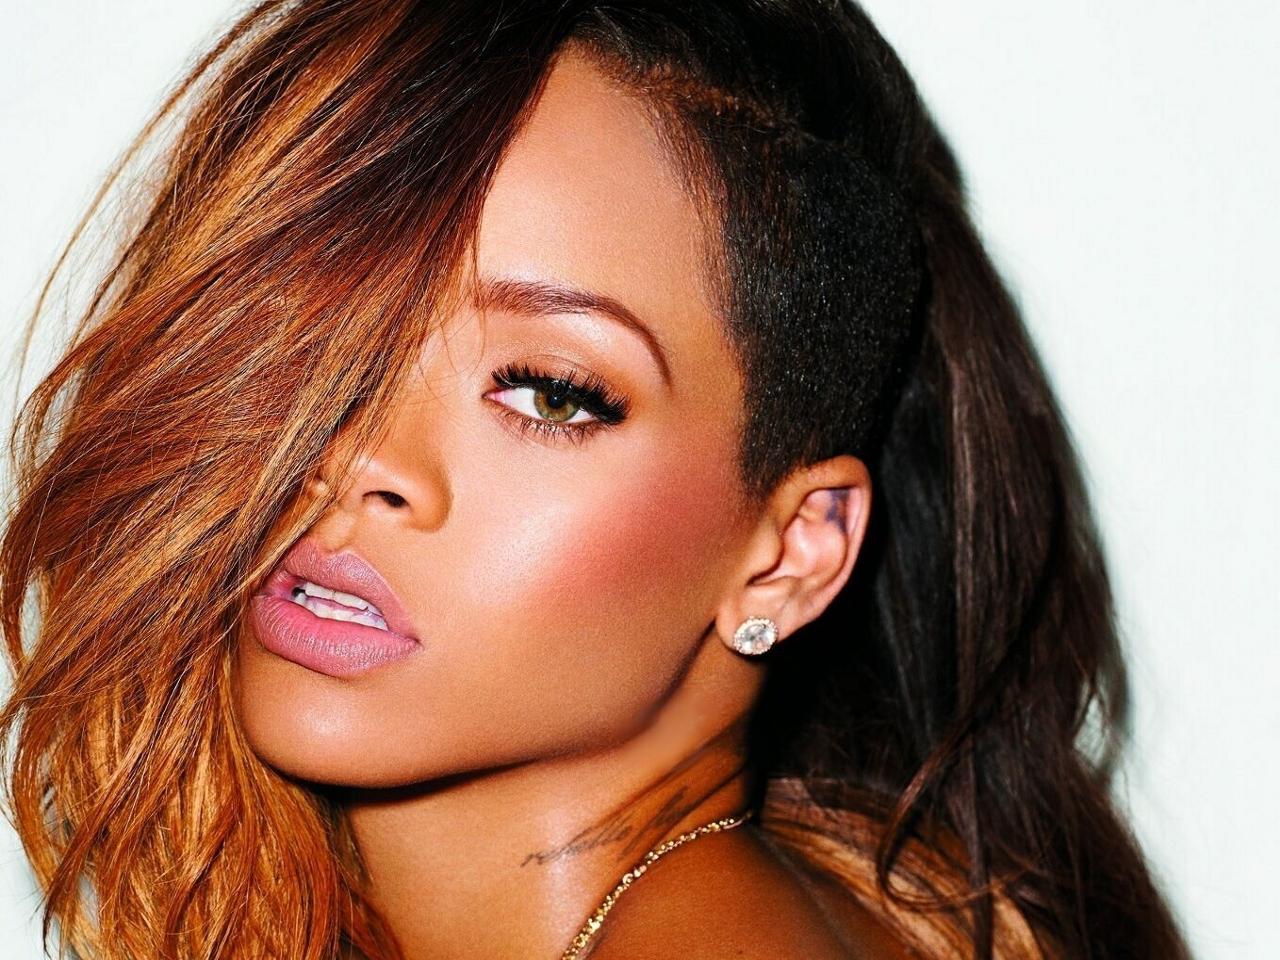 Rihanna Rihanna for Rolling Stone